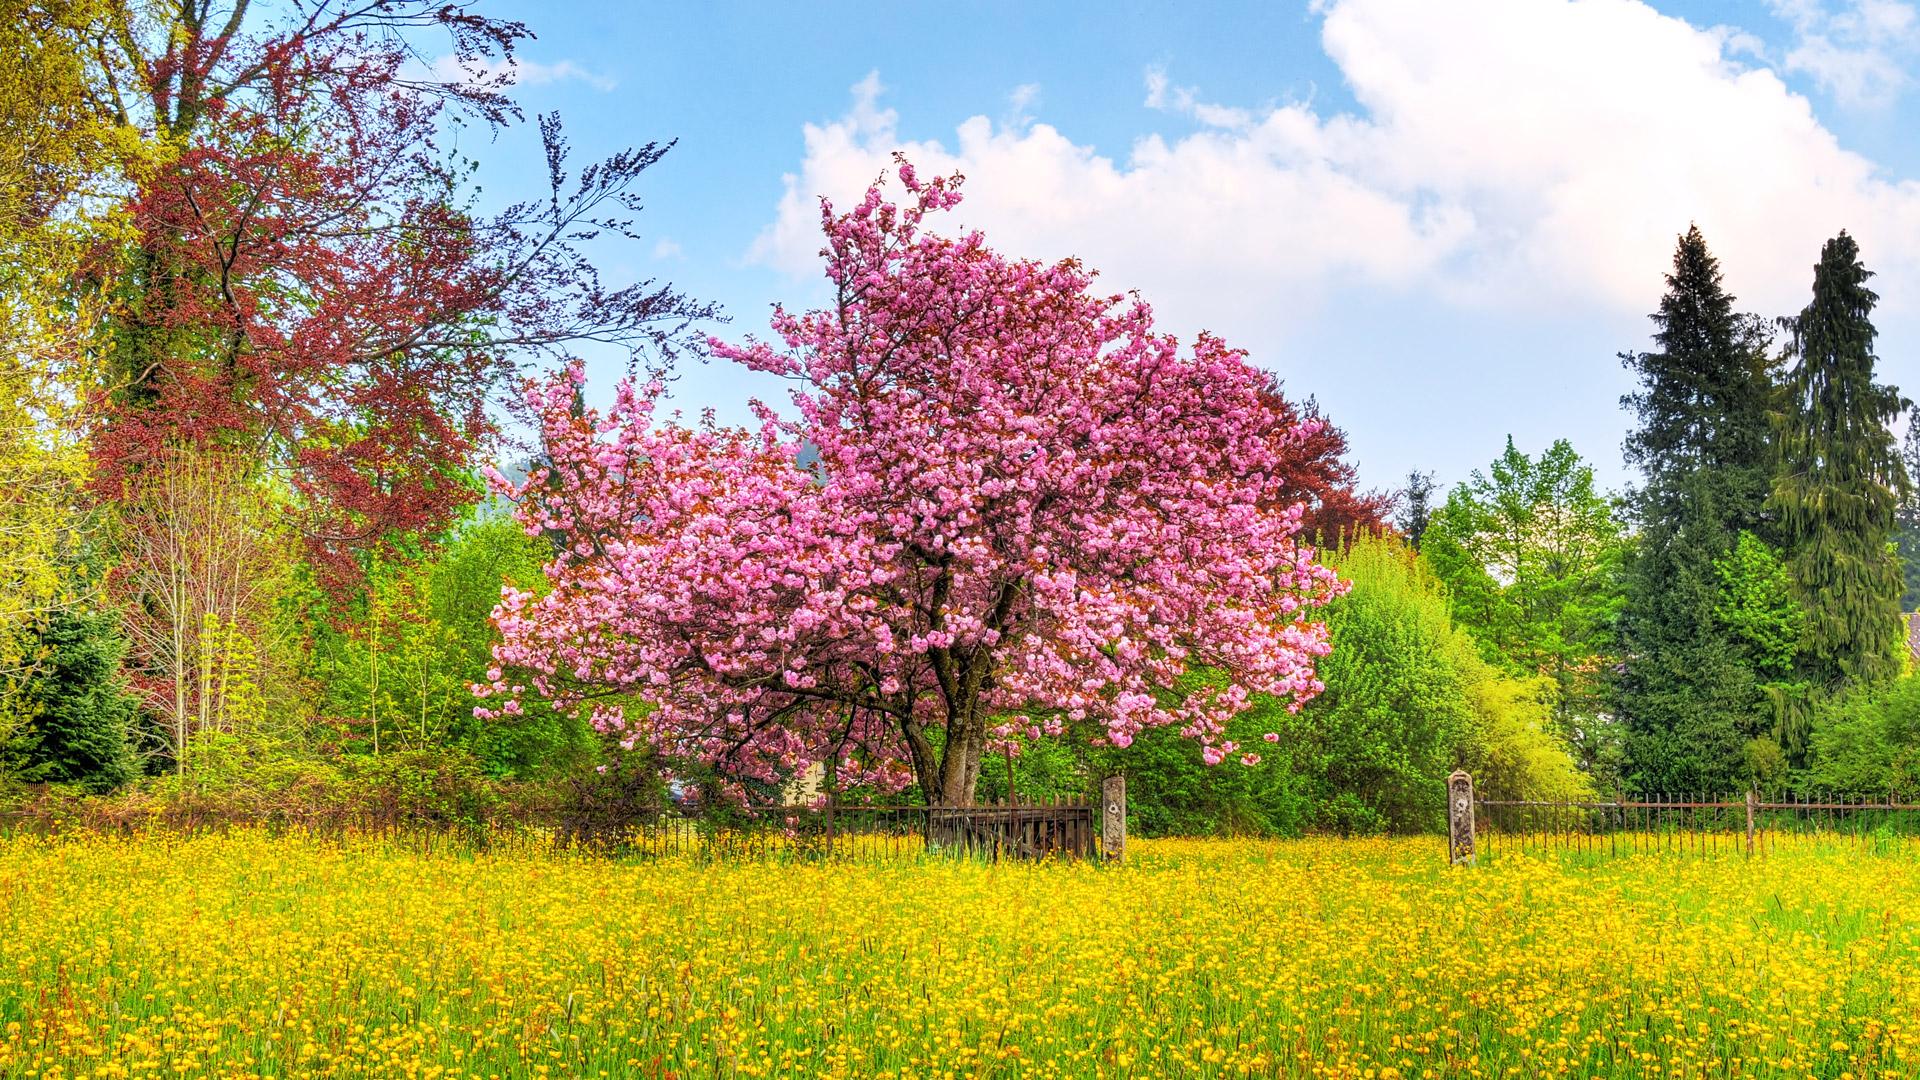 Spring HD Wallpapers 1080p Wide Screen Wallpaper 1080p2K4K 1920x1080